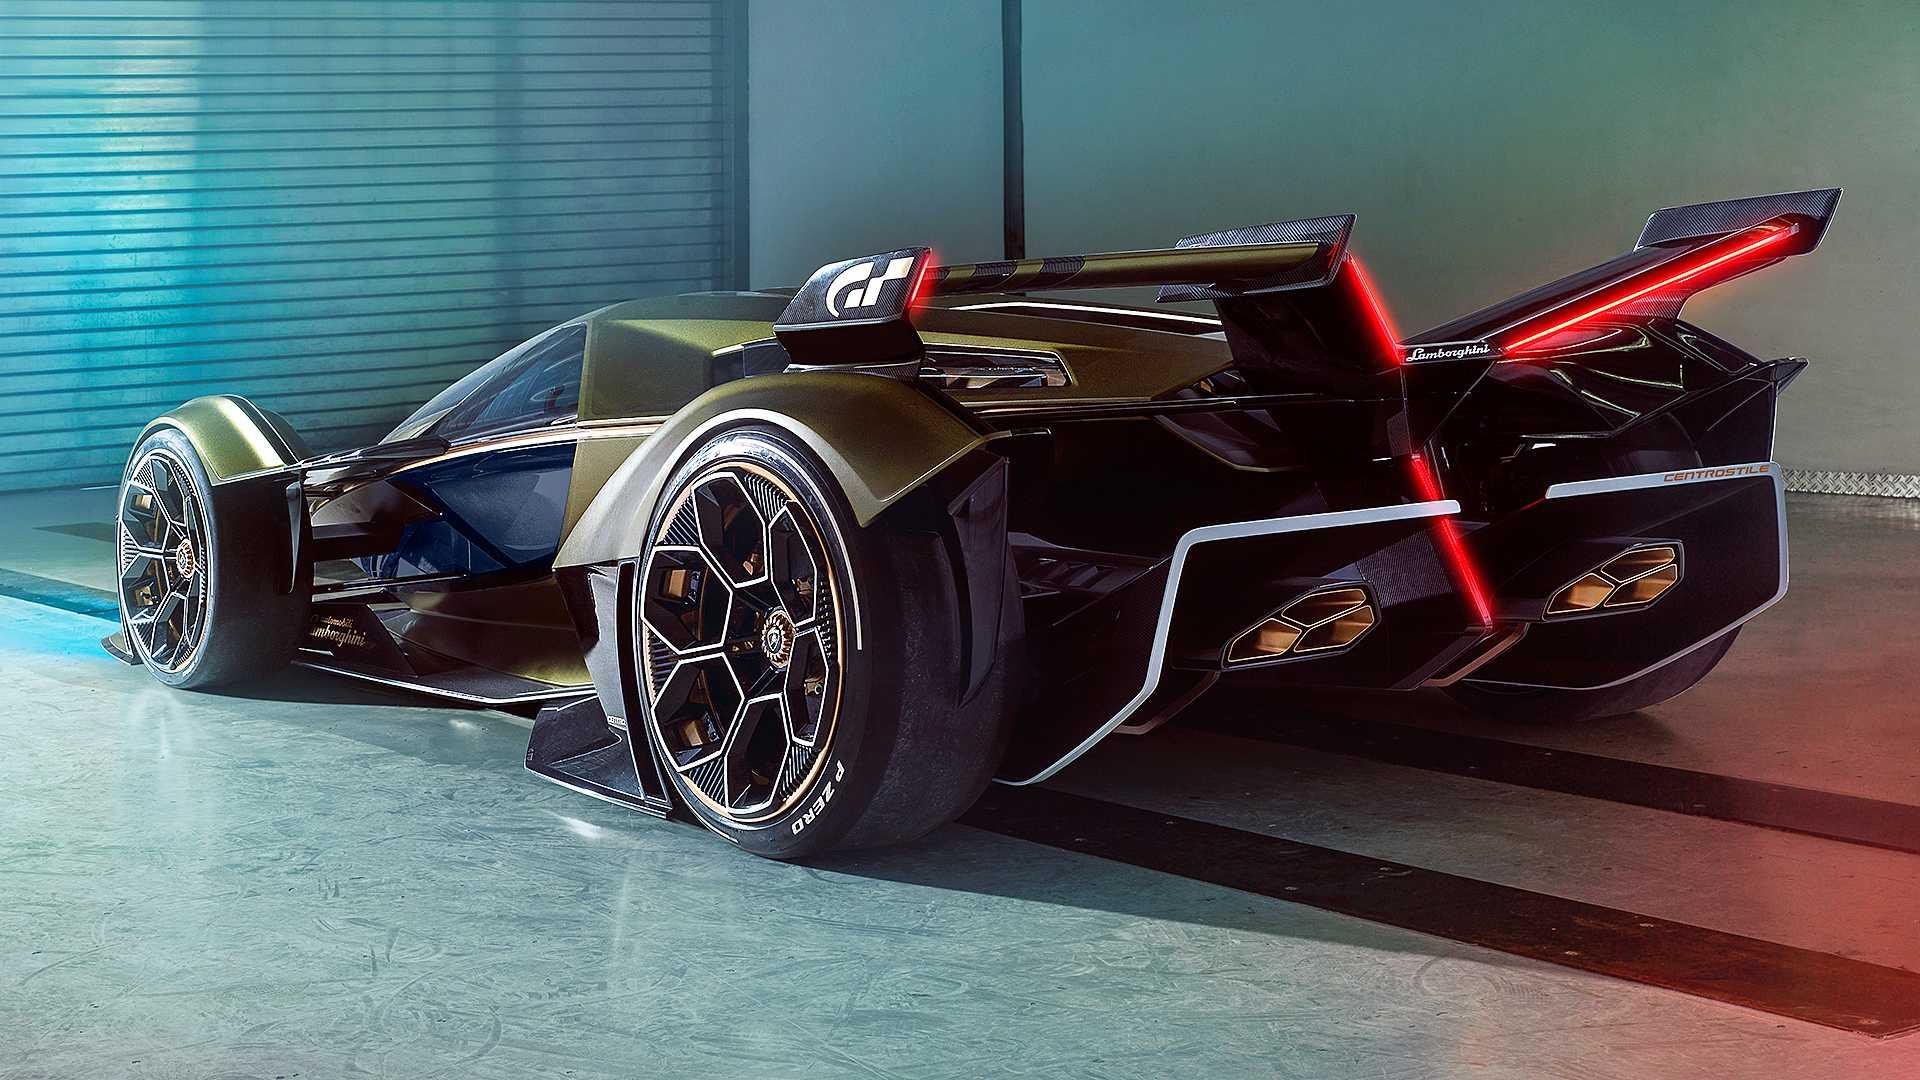 Lamborghini-V12-Vision-Gran-Turismo-2